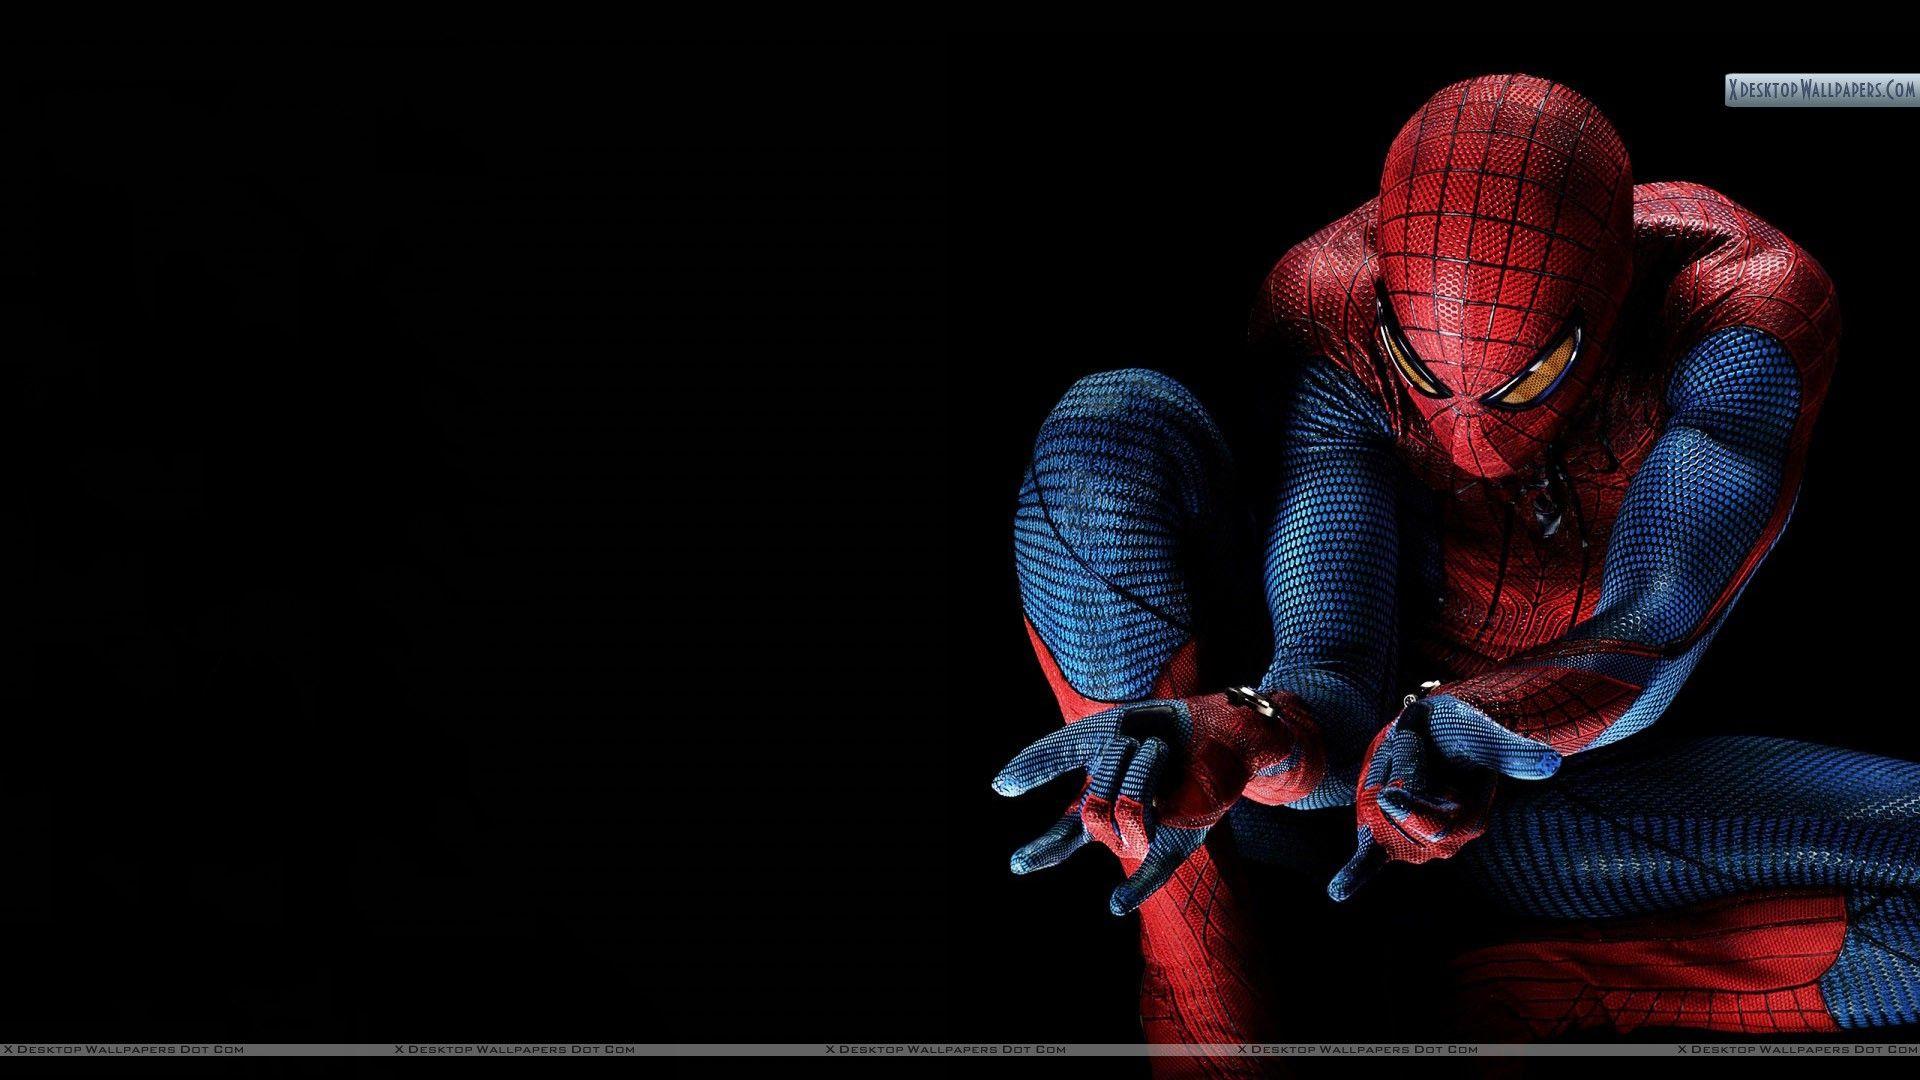 spiderman wallpaper hd,spider man,fictional character,superhero,action figure,cg artwork